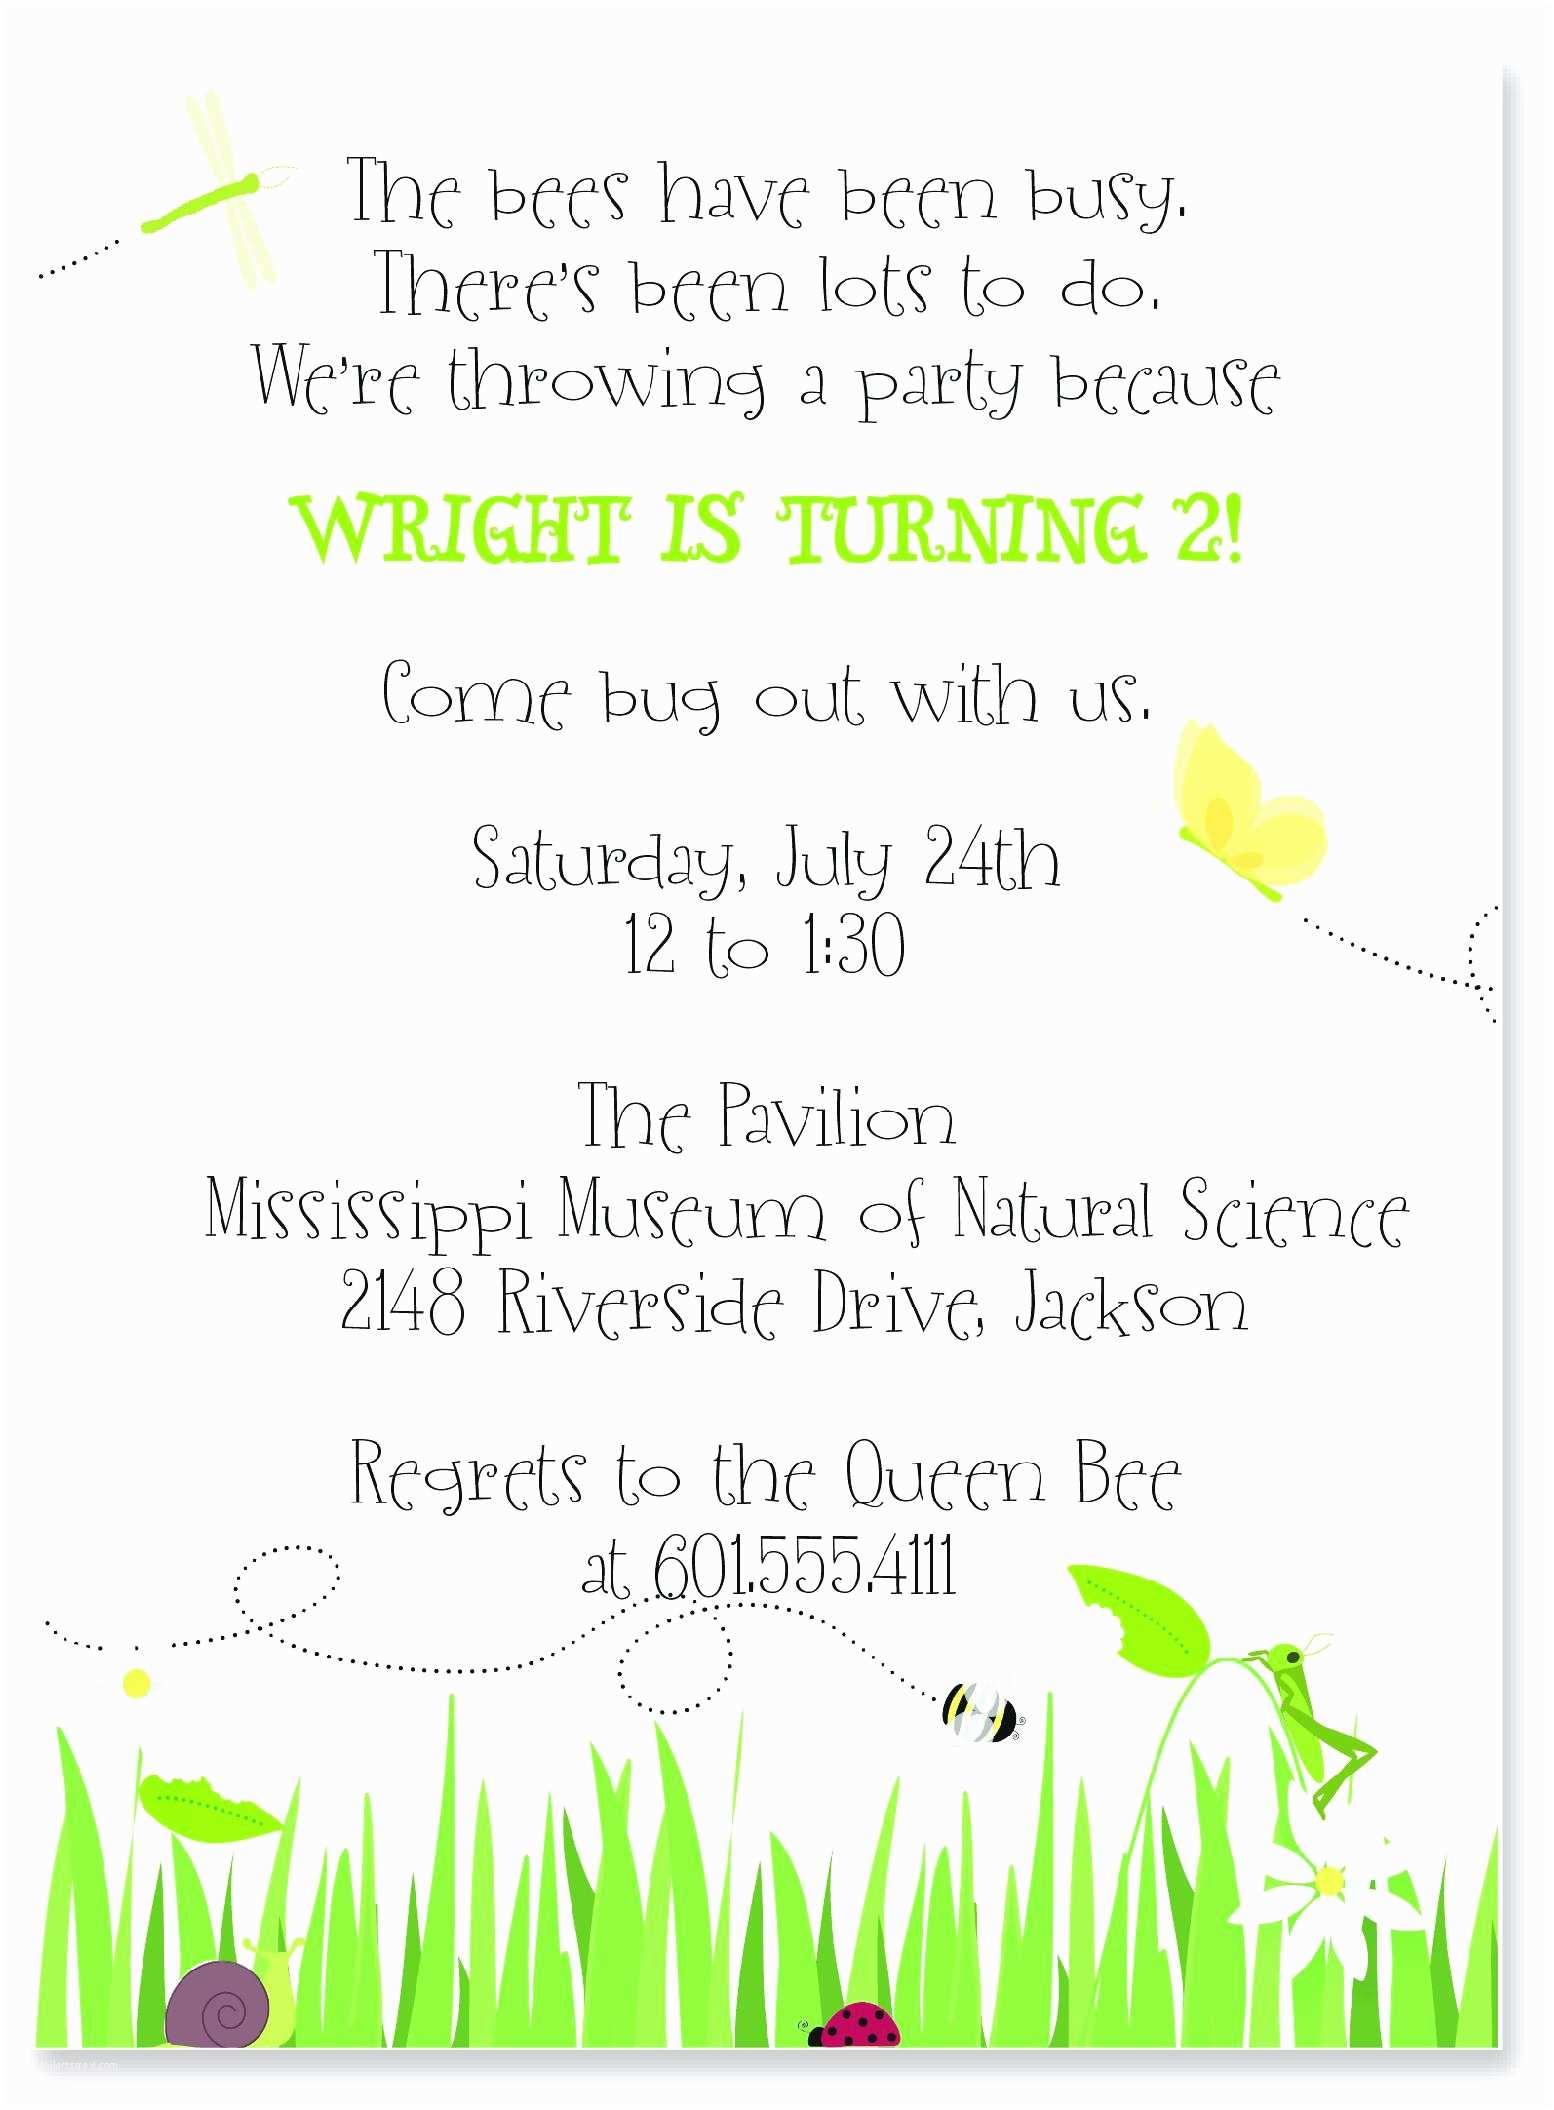 Email Party Invitations Email Party Invitations